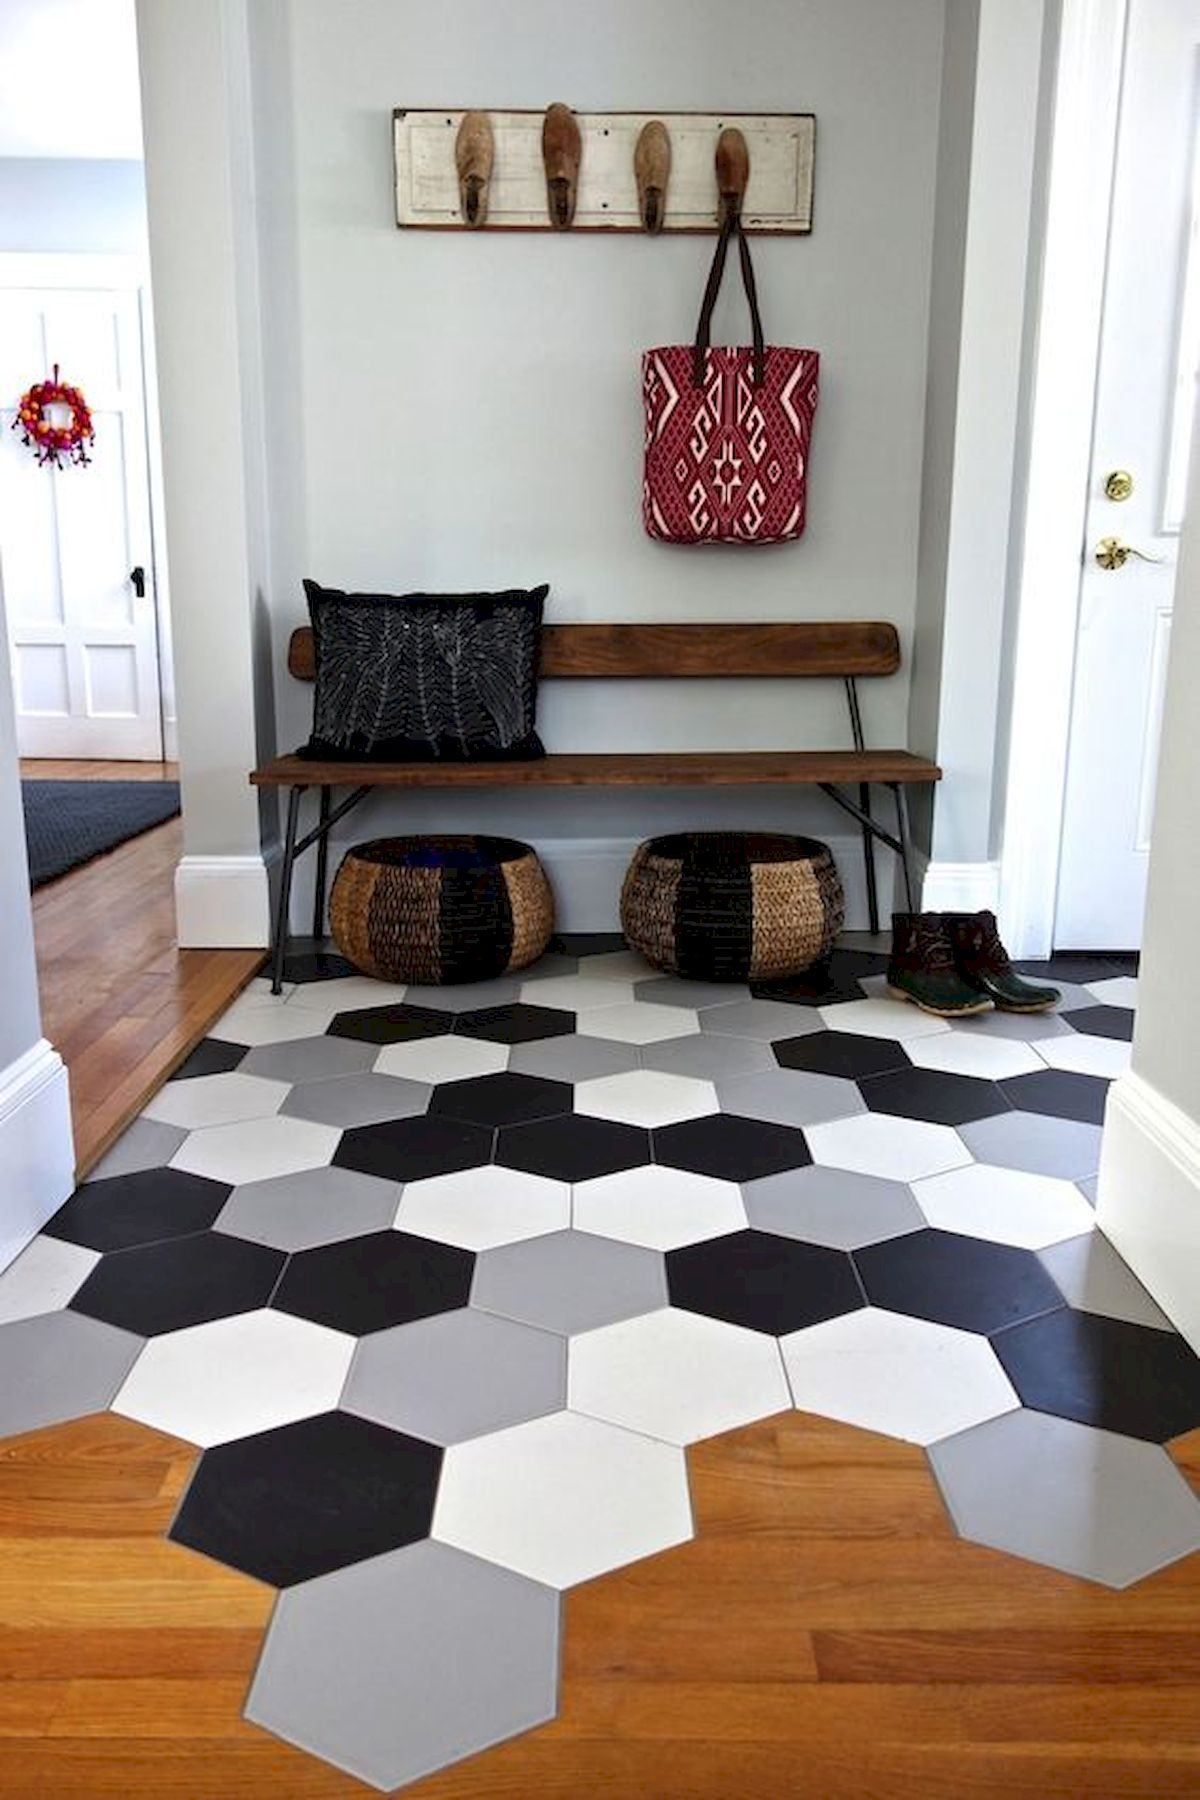 40 Best Tile Flooring Designs Ideas For Modern Kitchen (14)